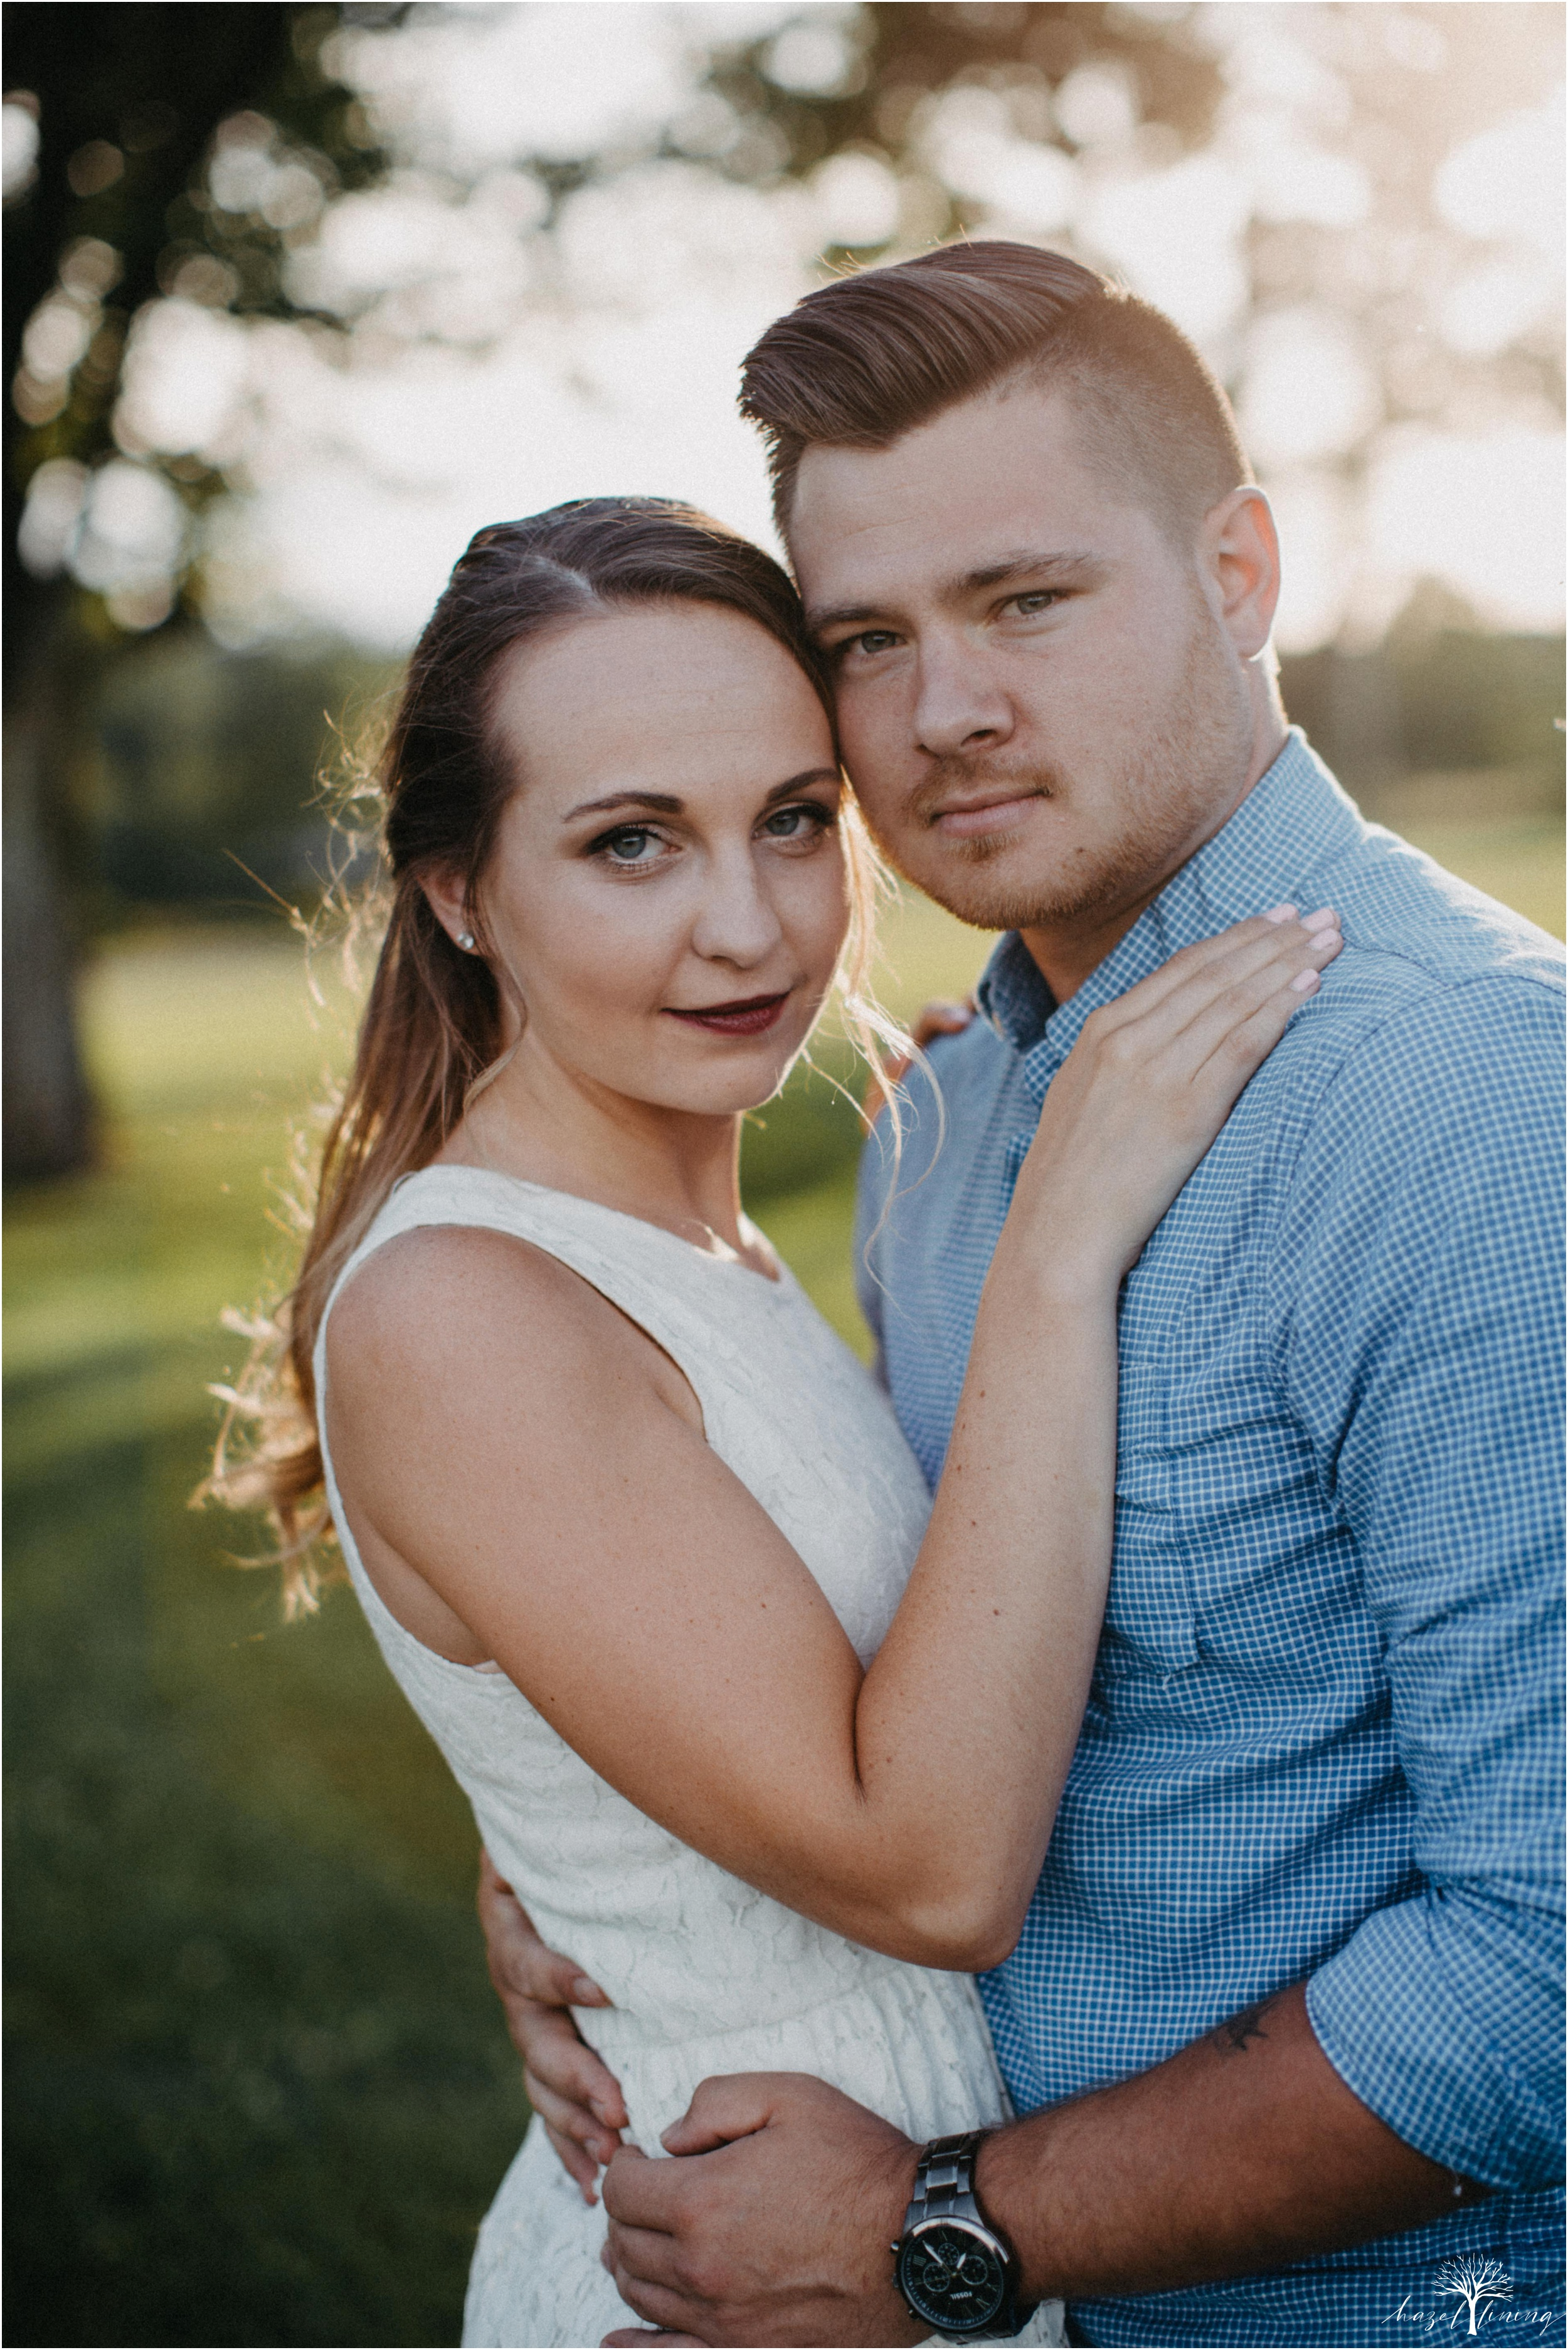 rachel-warner-chris-niedrist-the-farm-bakery-and-events-quakertown-pa-summer-engagement-hazel-lining-photography-destination-elopement-wedding-engagement-photography_0020.jpg